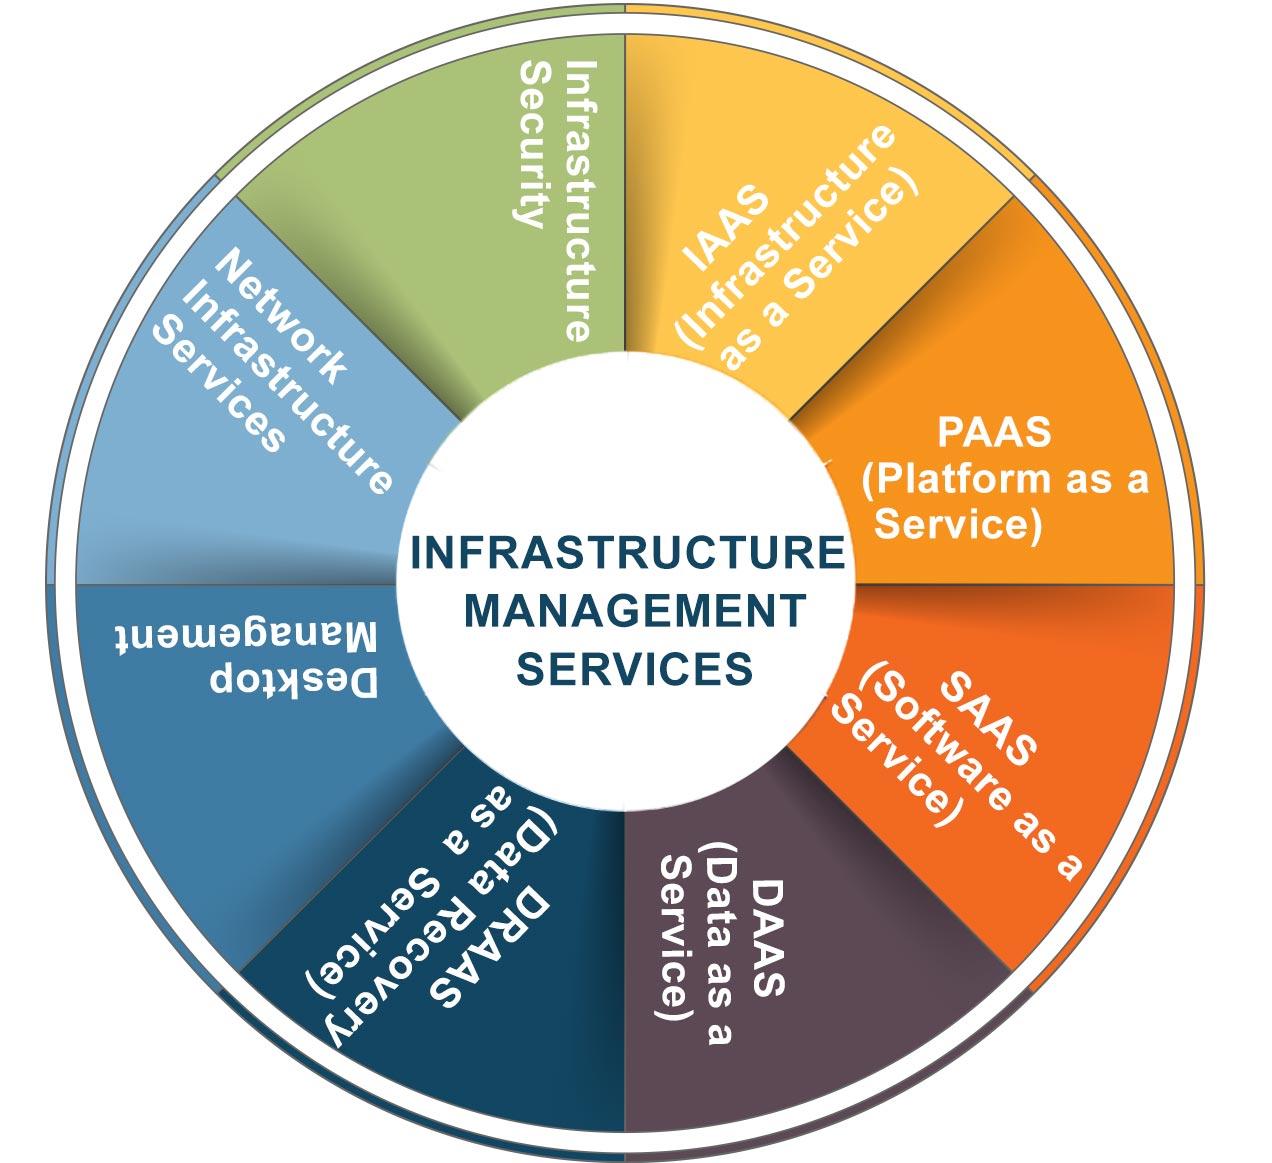 ServerManagement InfrastructureManagementService